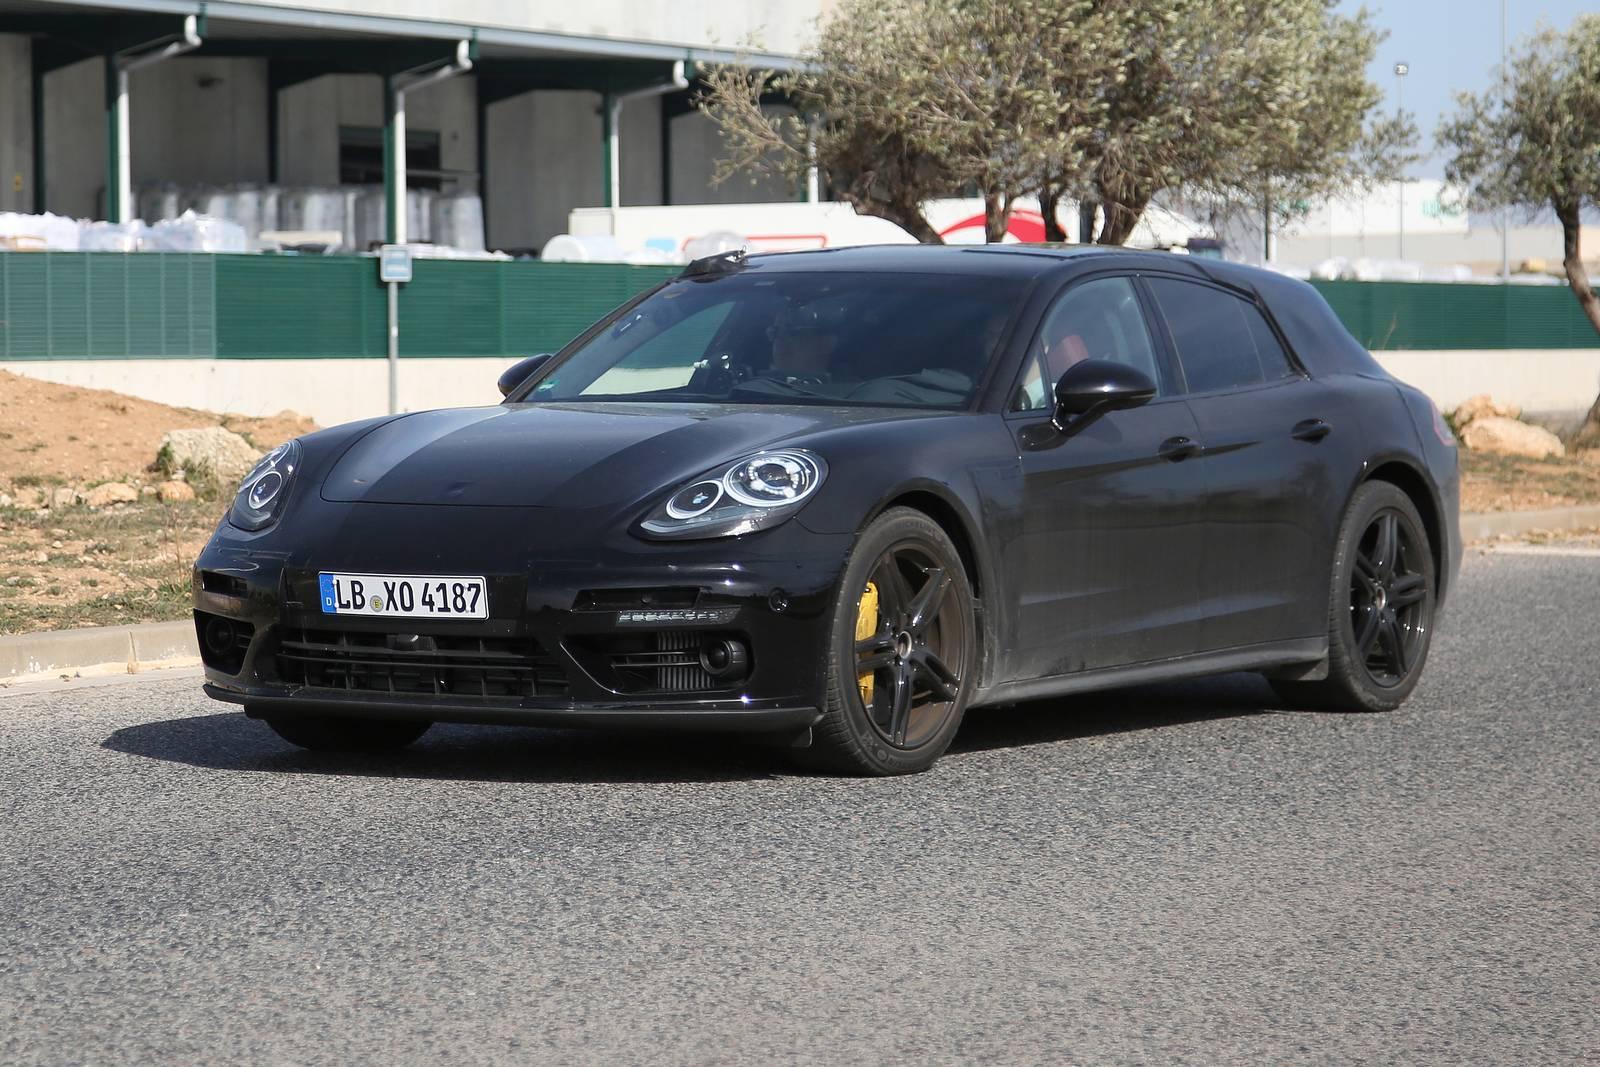 2018 porsche panamera shooting brake latest spy shots gtspirit -  Porsche Panamera Shooting Brake New Spy Shots Supercar